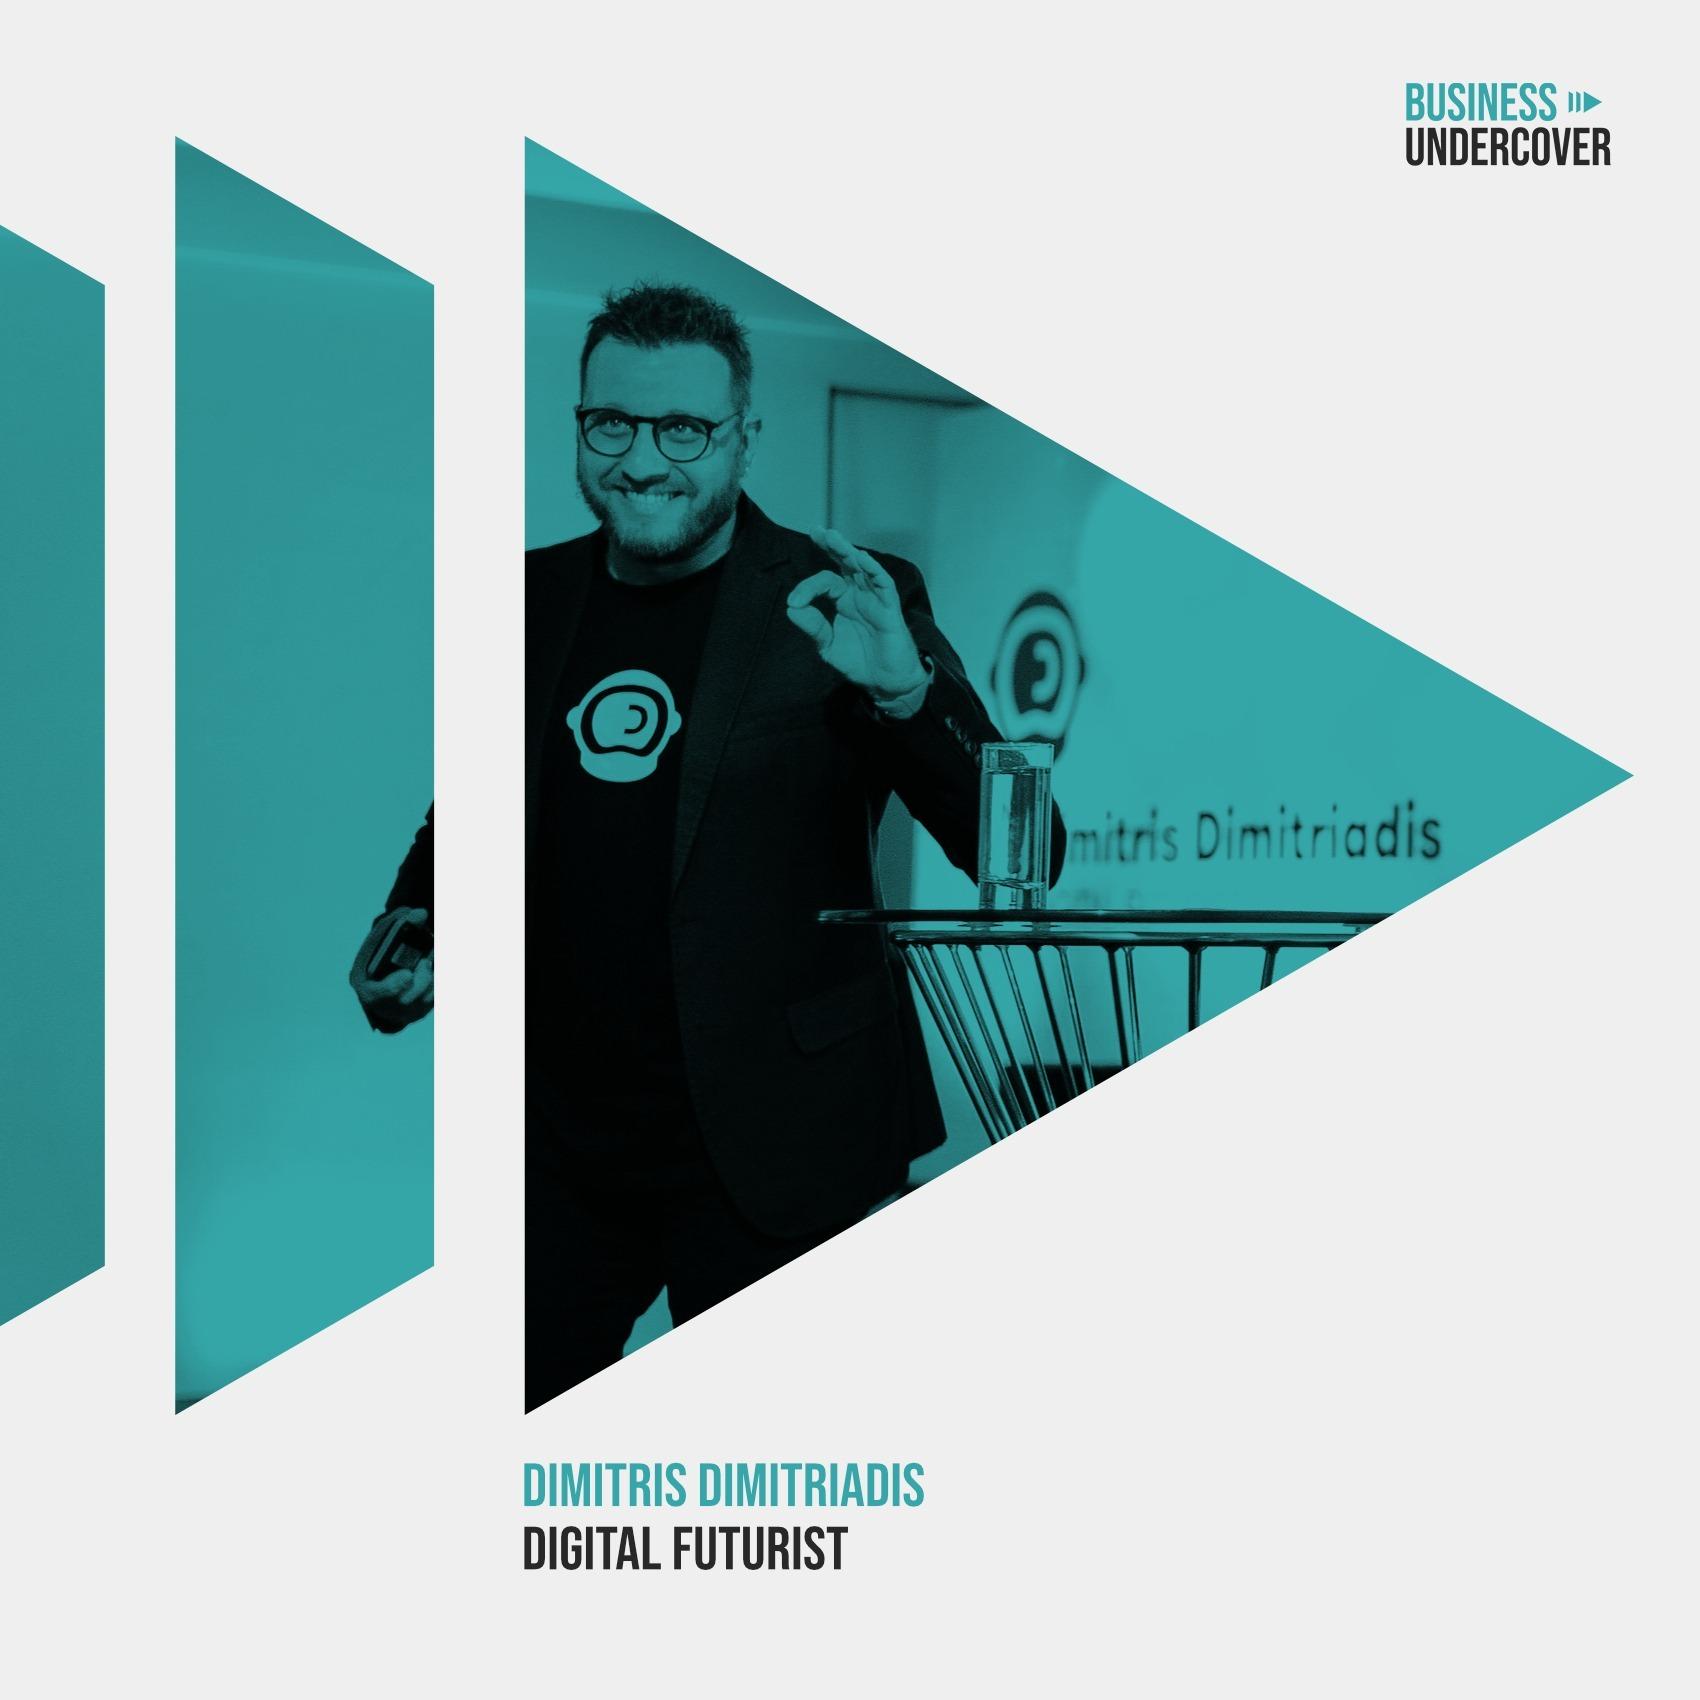 [1/2] Social Media & Η νέα πραγματικότητα στο Digital Marketing — Δημήτρης Δημητριάδης